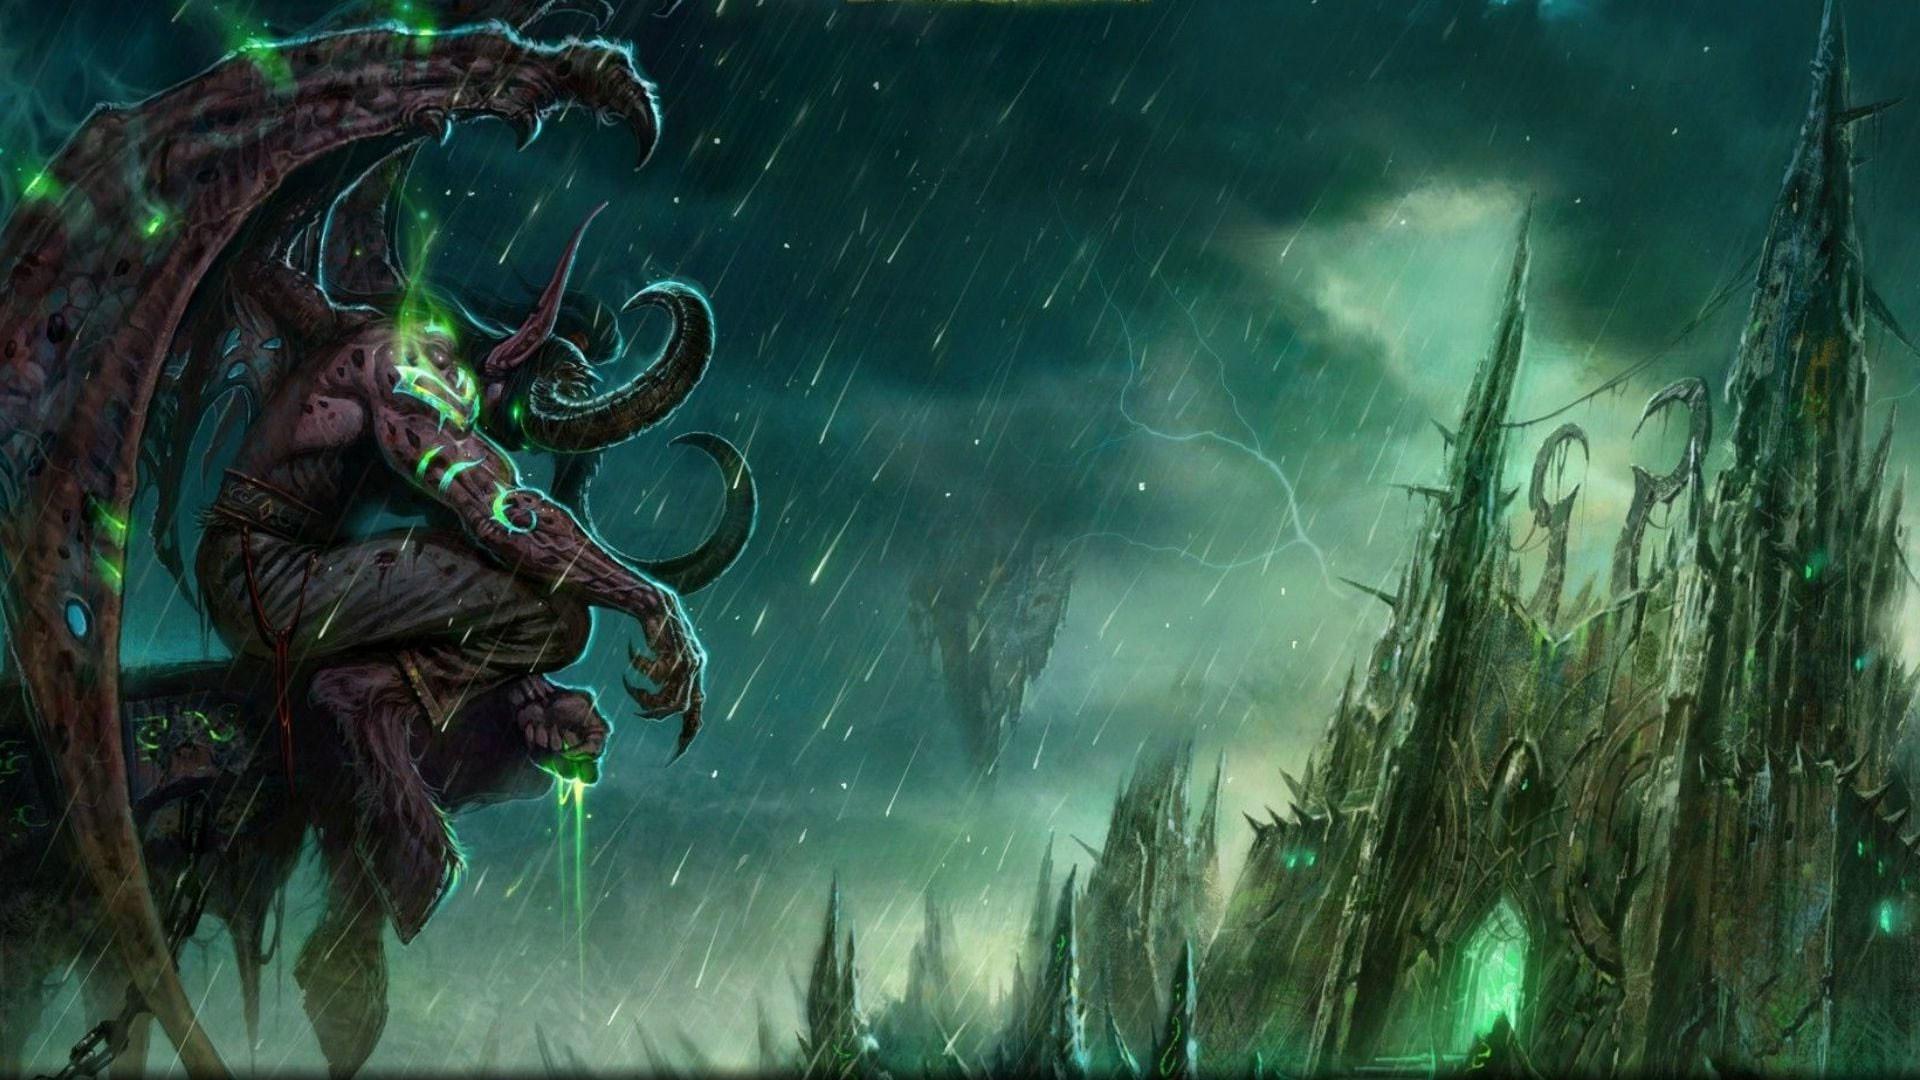 … of Warcraft Legion 1080p Wallpaper …